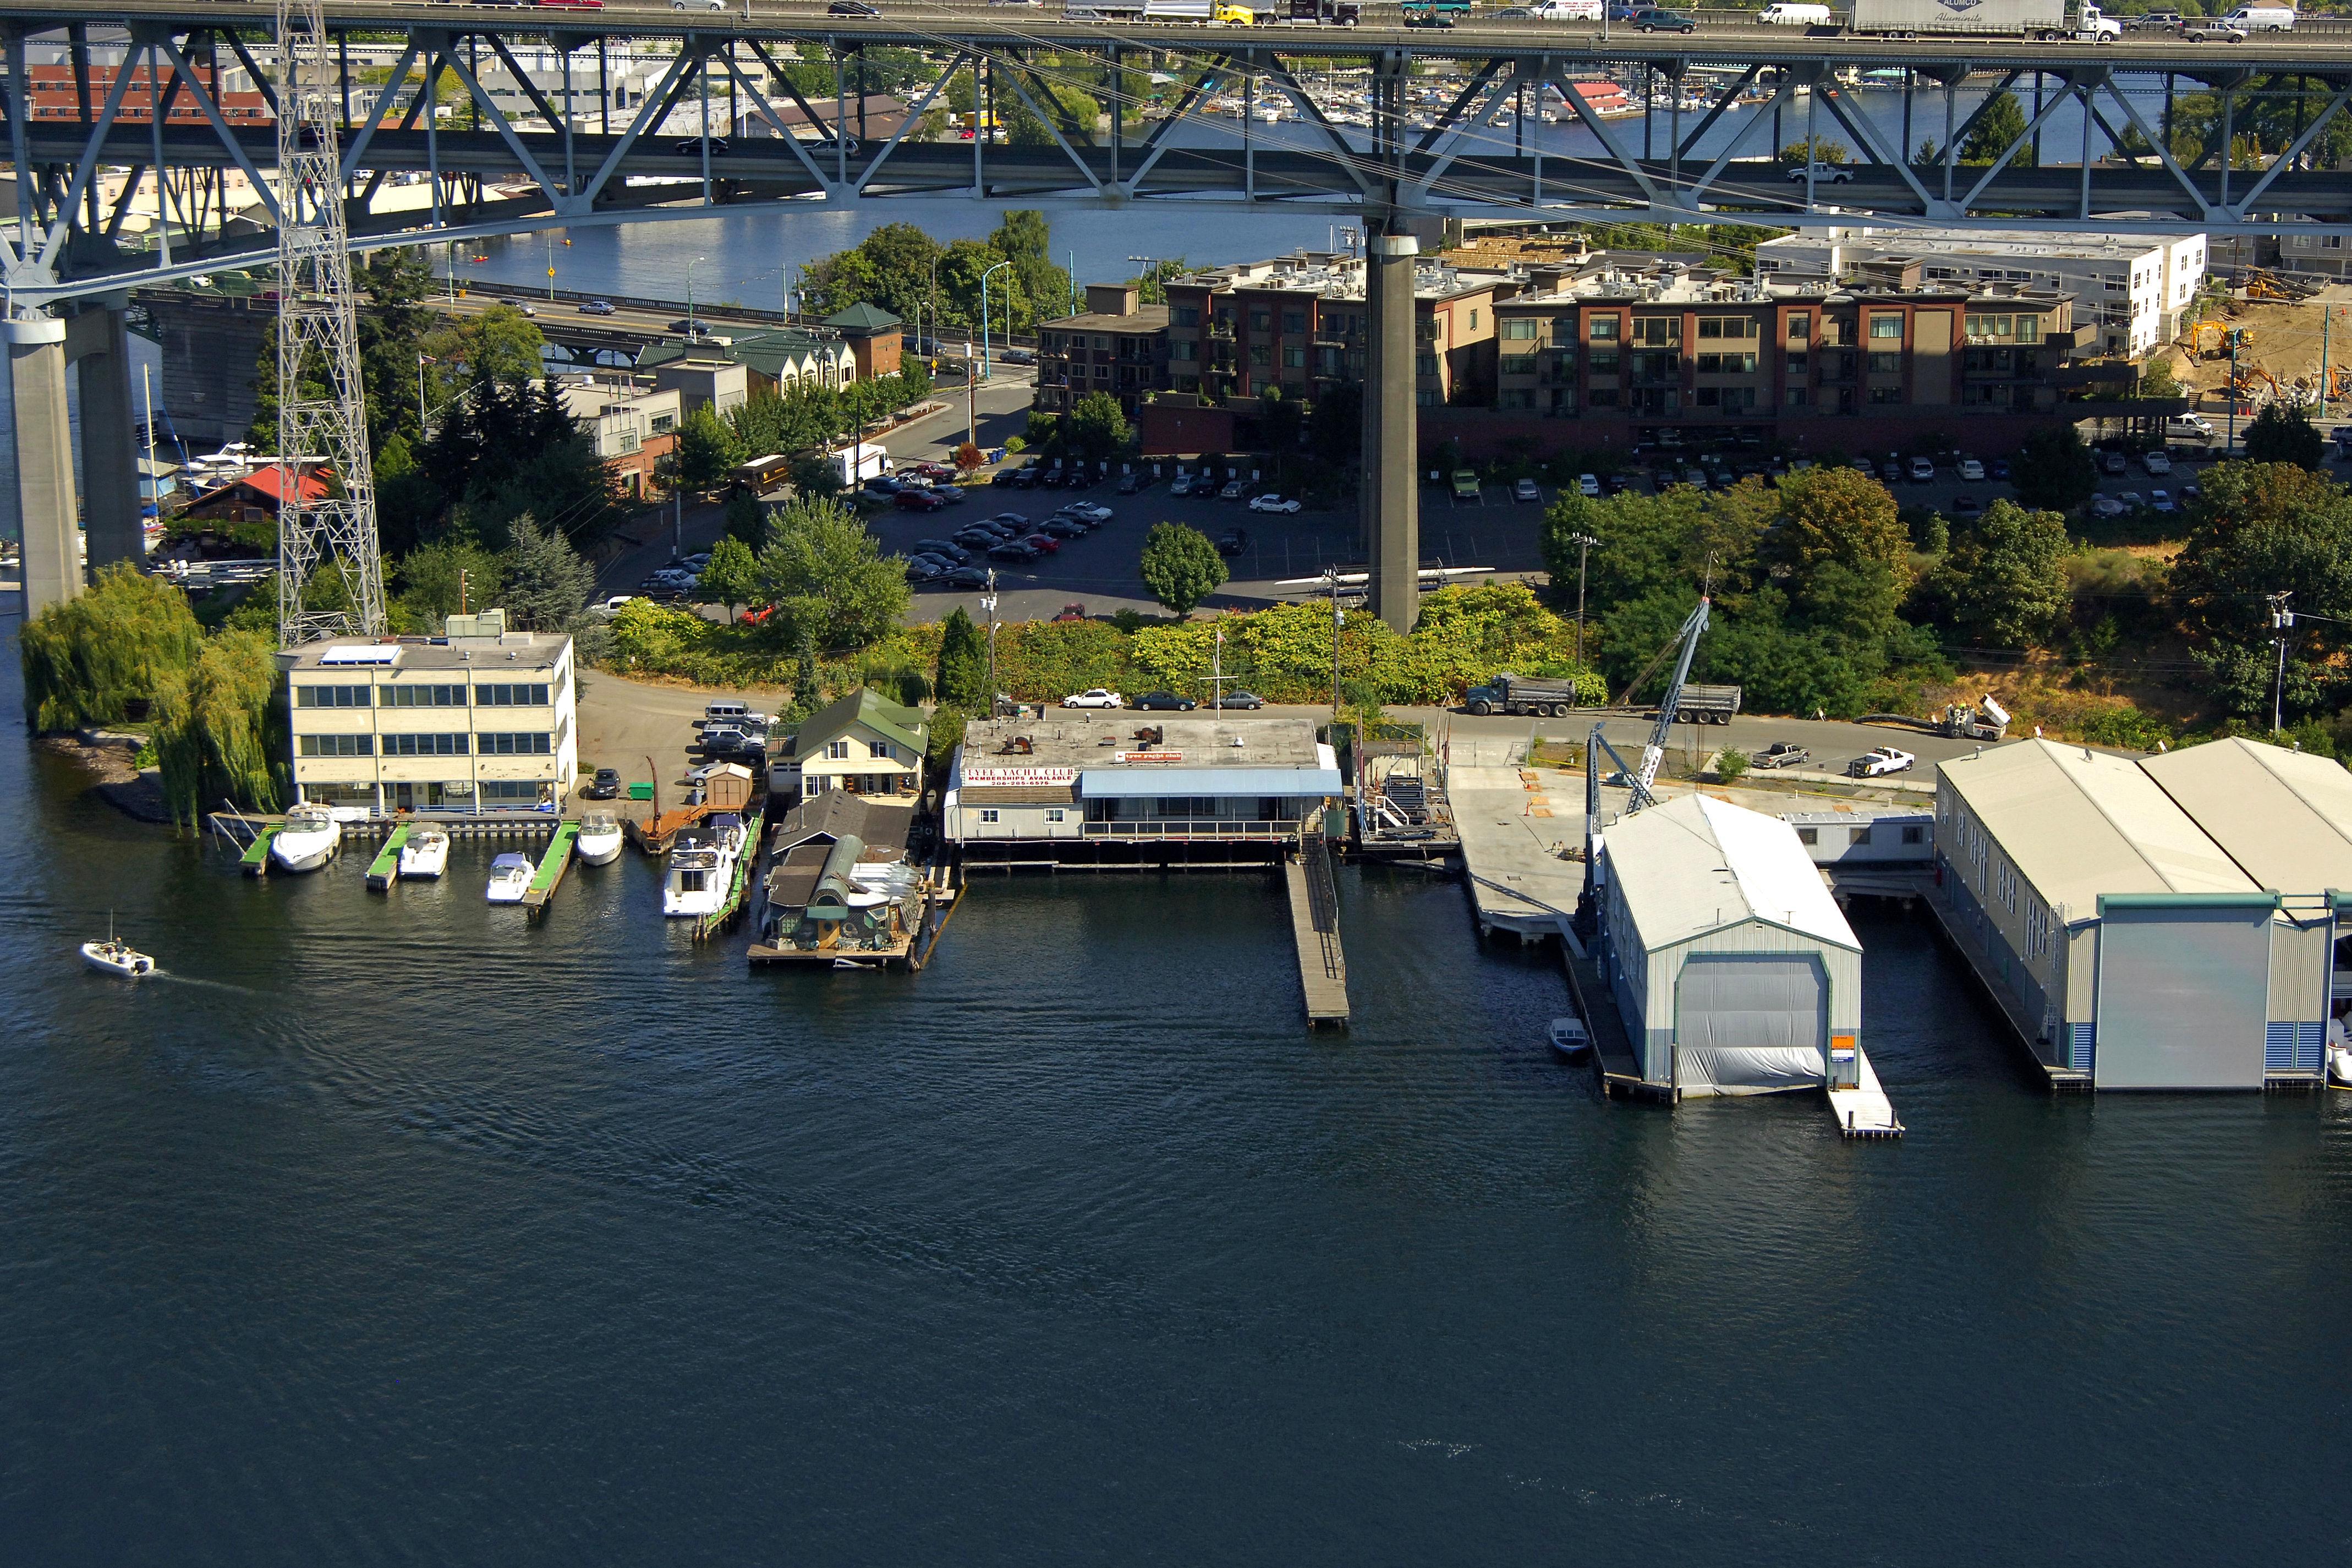 Tyee Yacht Club in Seattle, WA, United States - Marina